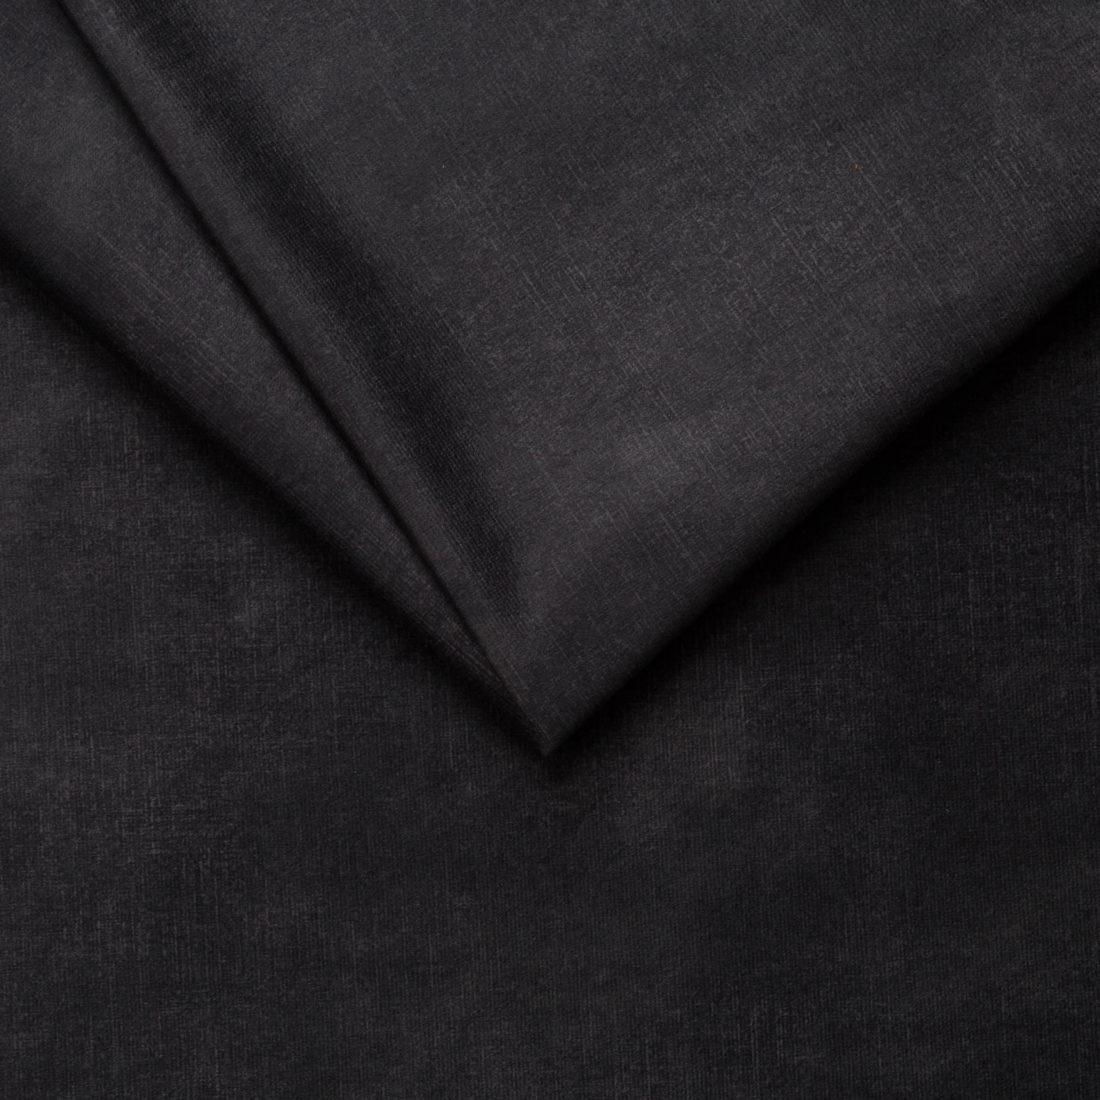 Меблева тканина Palladium 19 Graphite, велюр